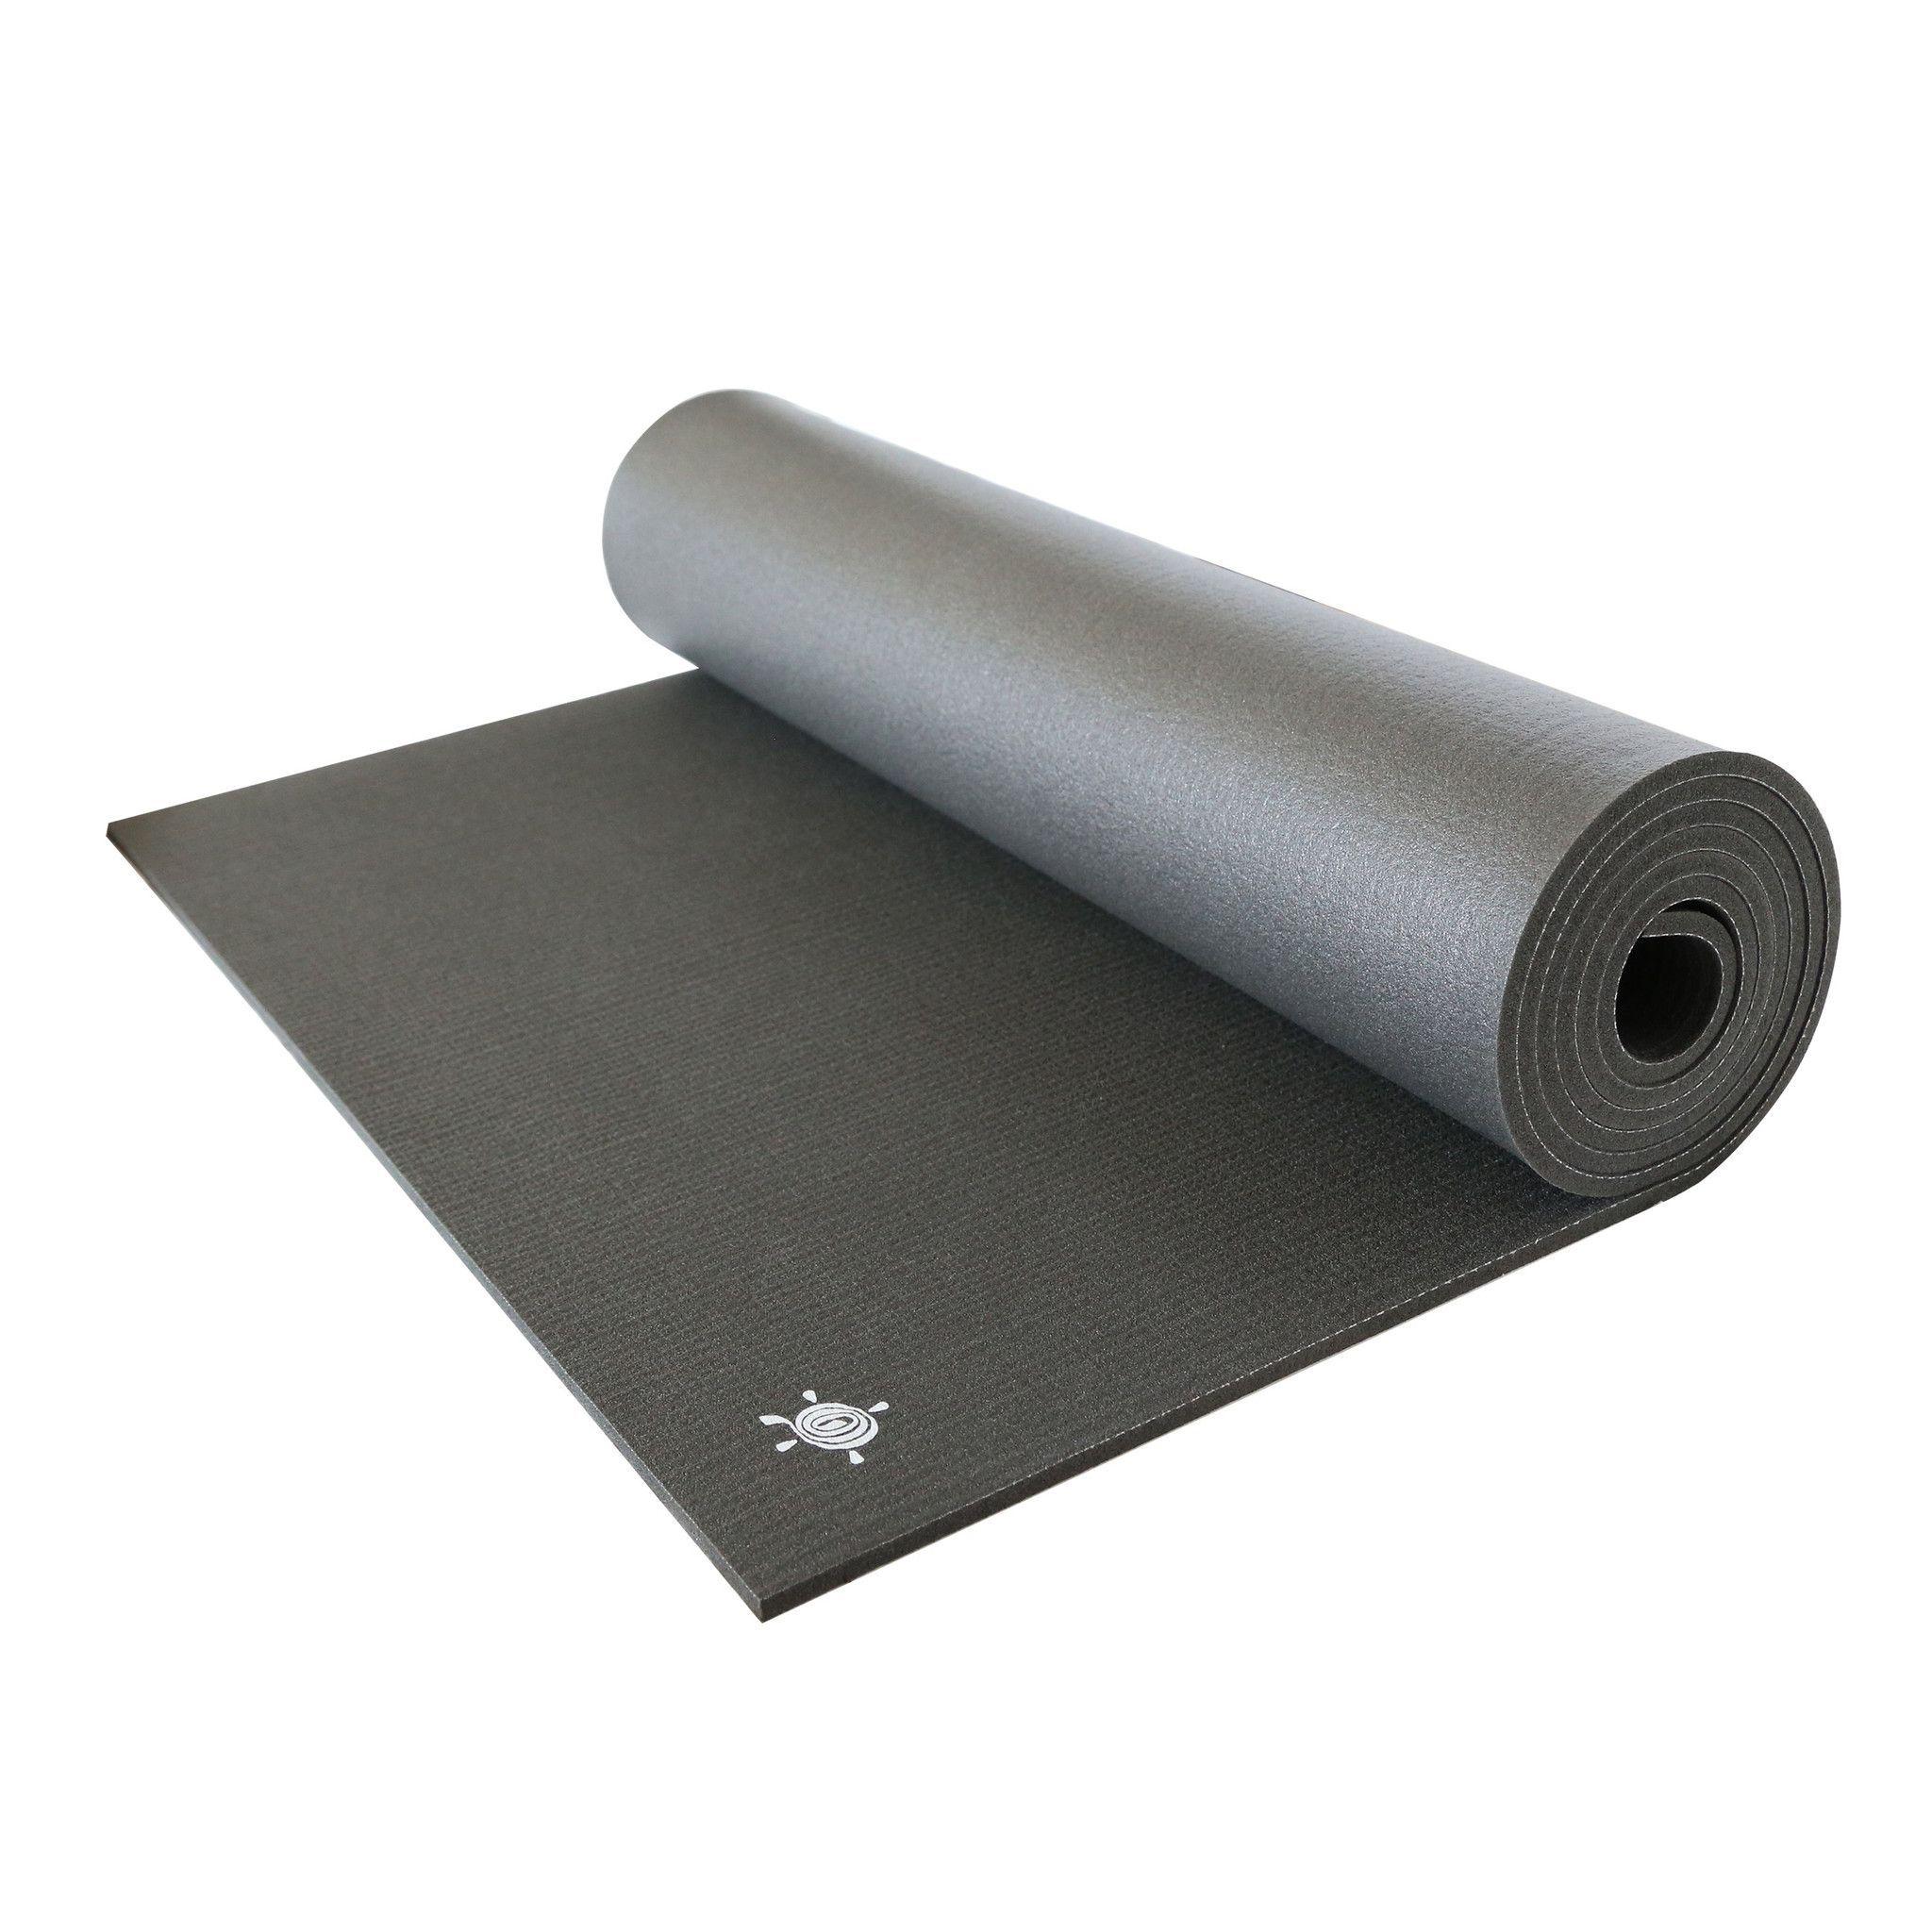 view gaiam harmony sol dp larger mat com jade professional mats grip yoga amazon sure cranberry sports